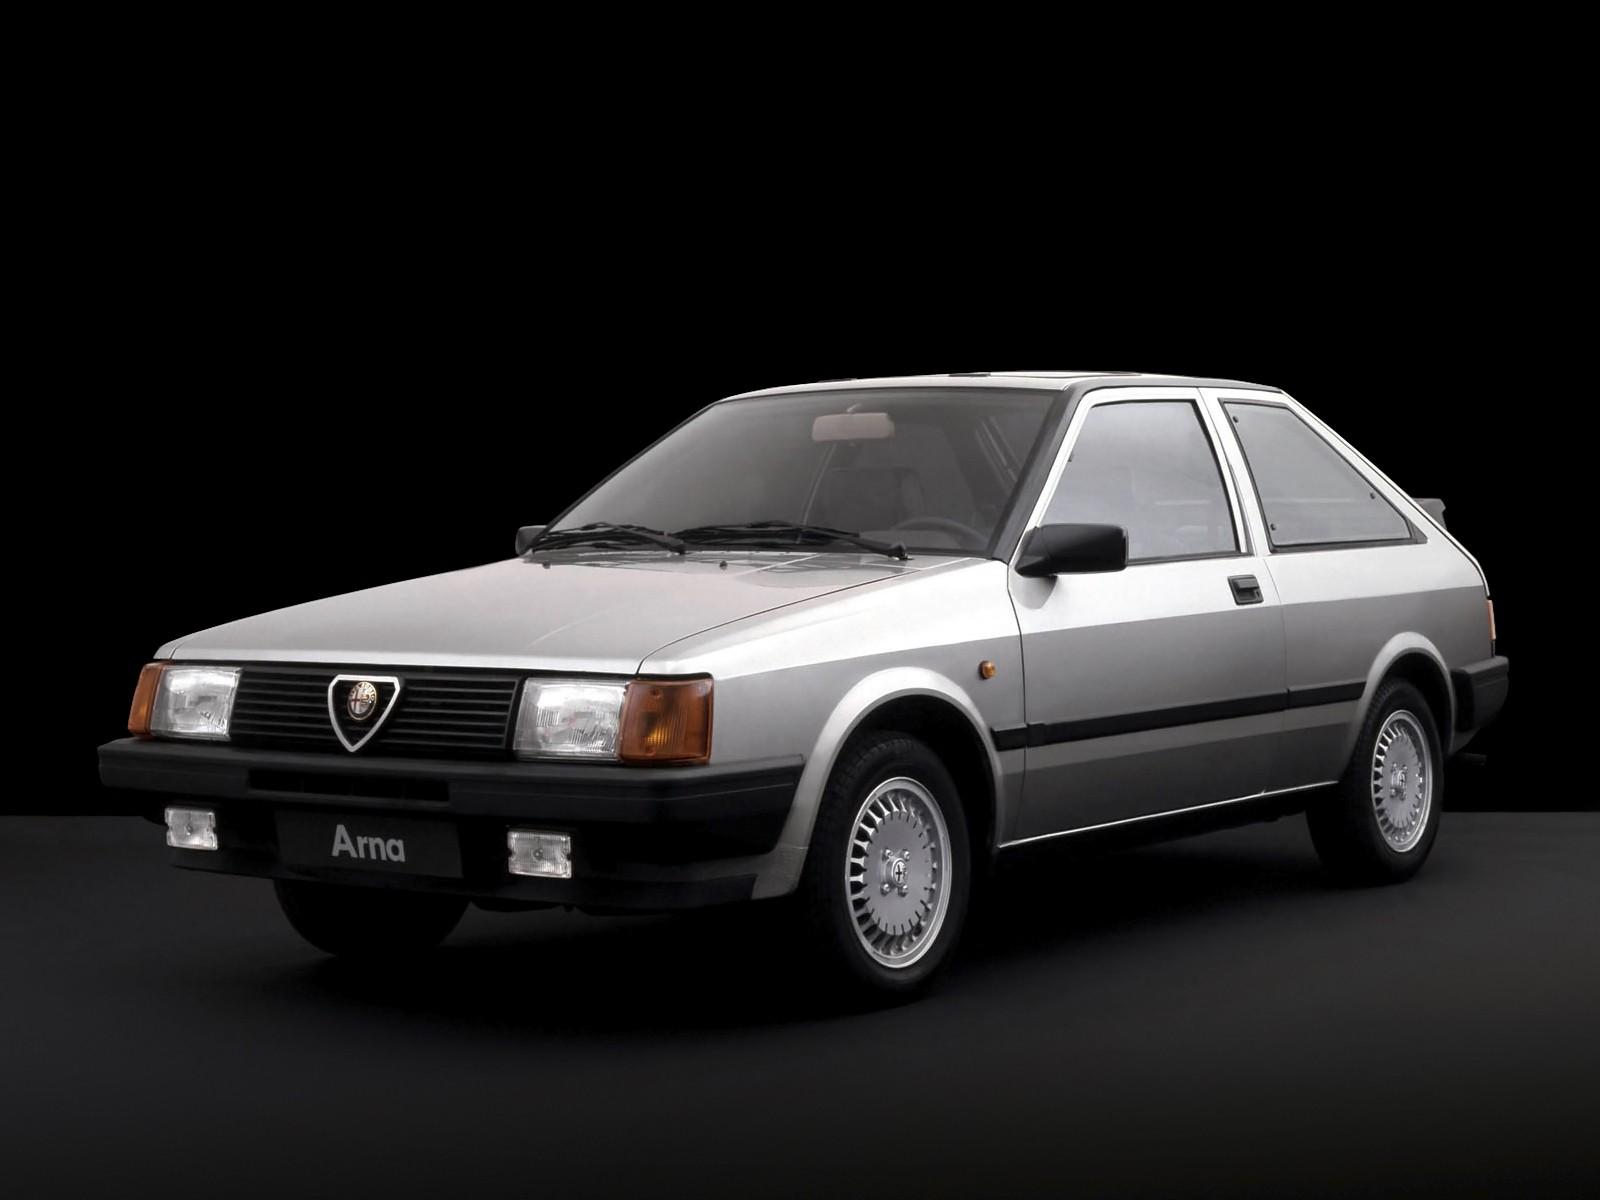 Naples Car Show >> ALFA ROMEO Arna specs & photos - 1983, 1984, 1985, 1986 ...